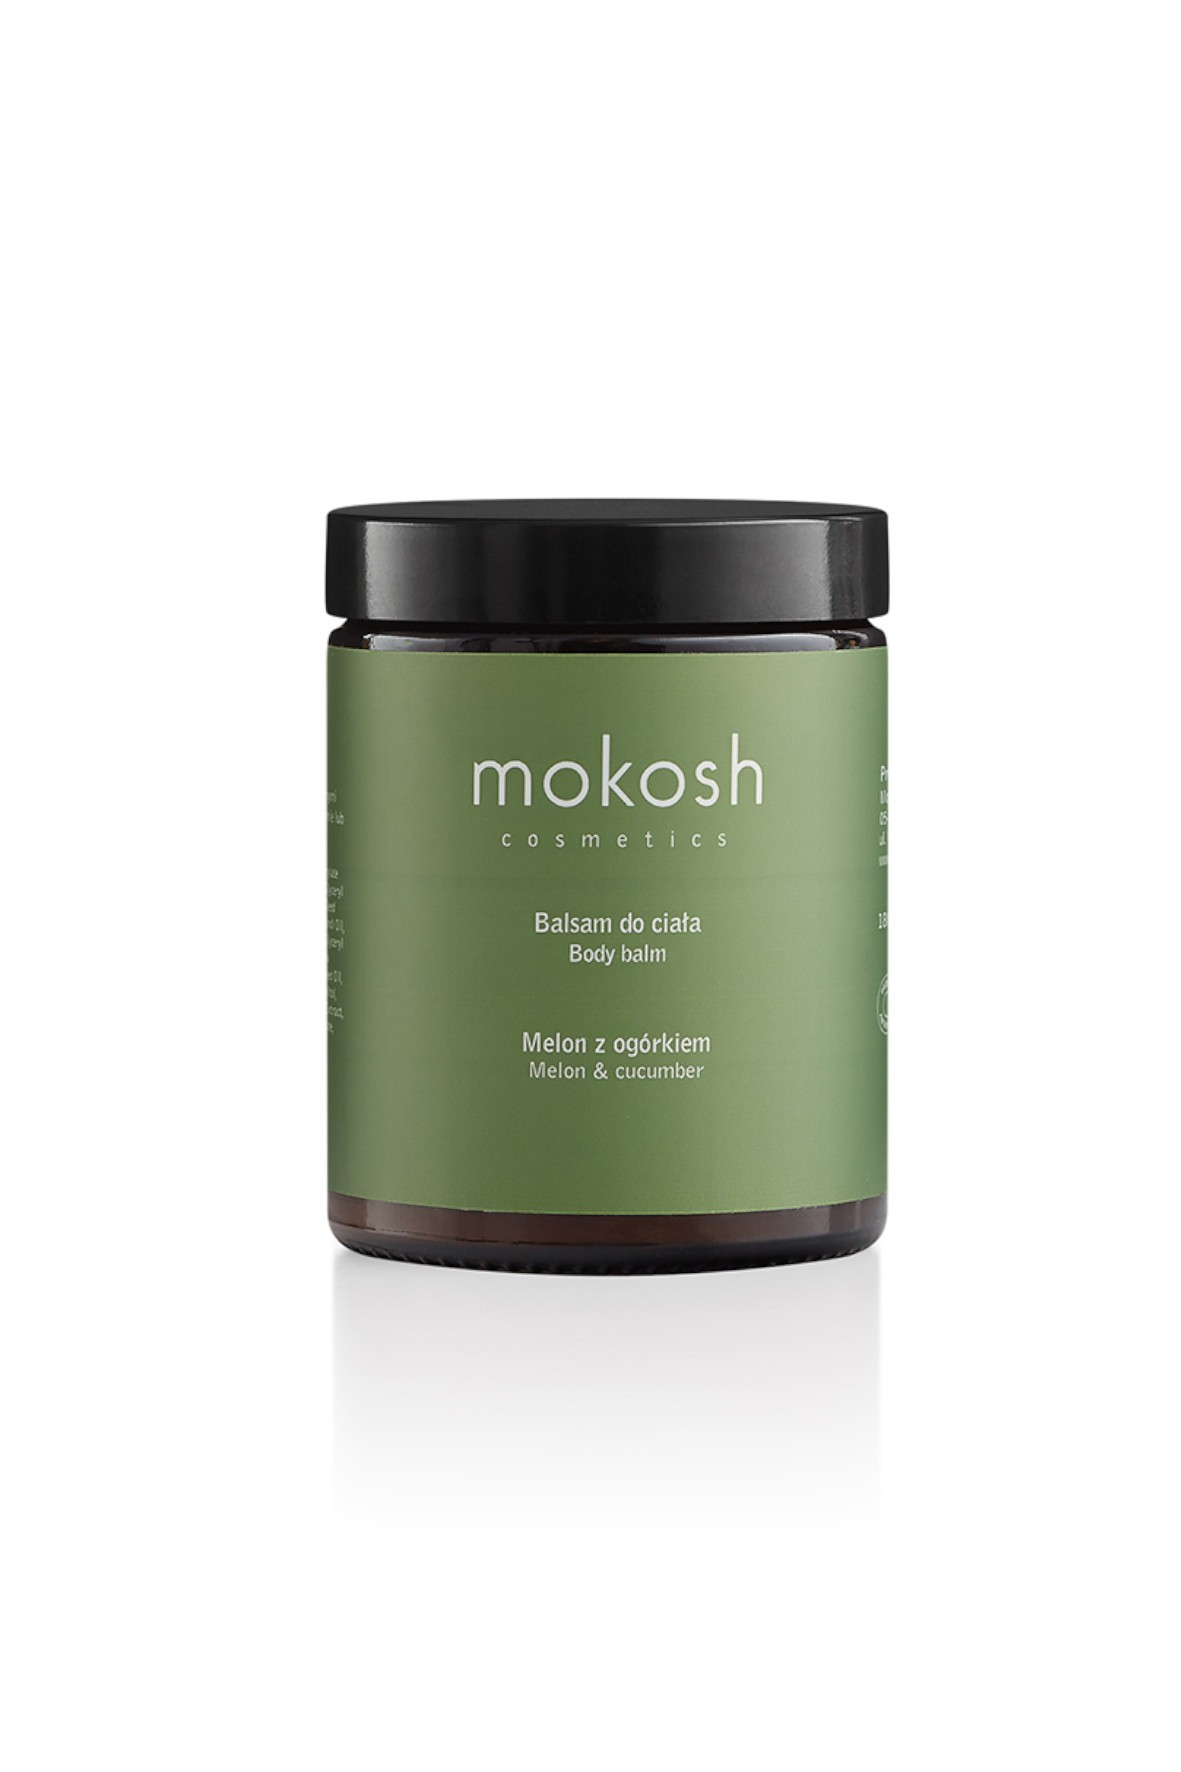 Mokosh Balsam do ciała Melon z ogórkiem 180 ml